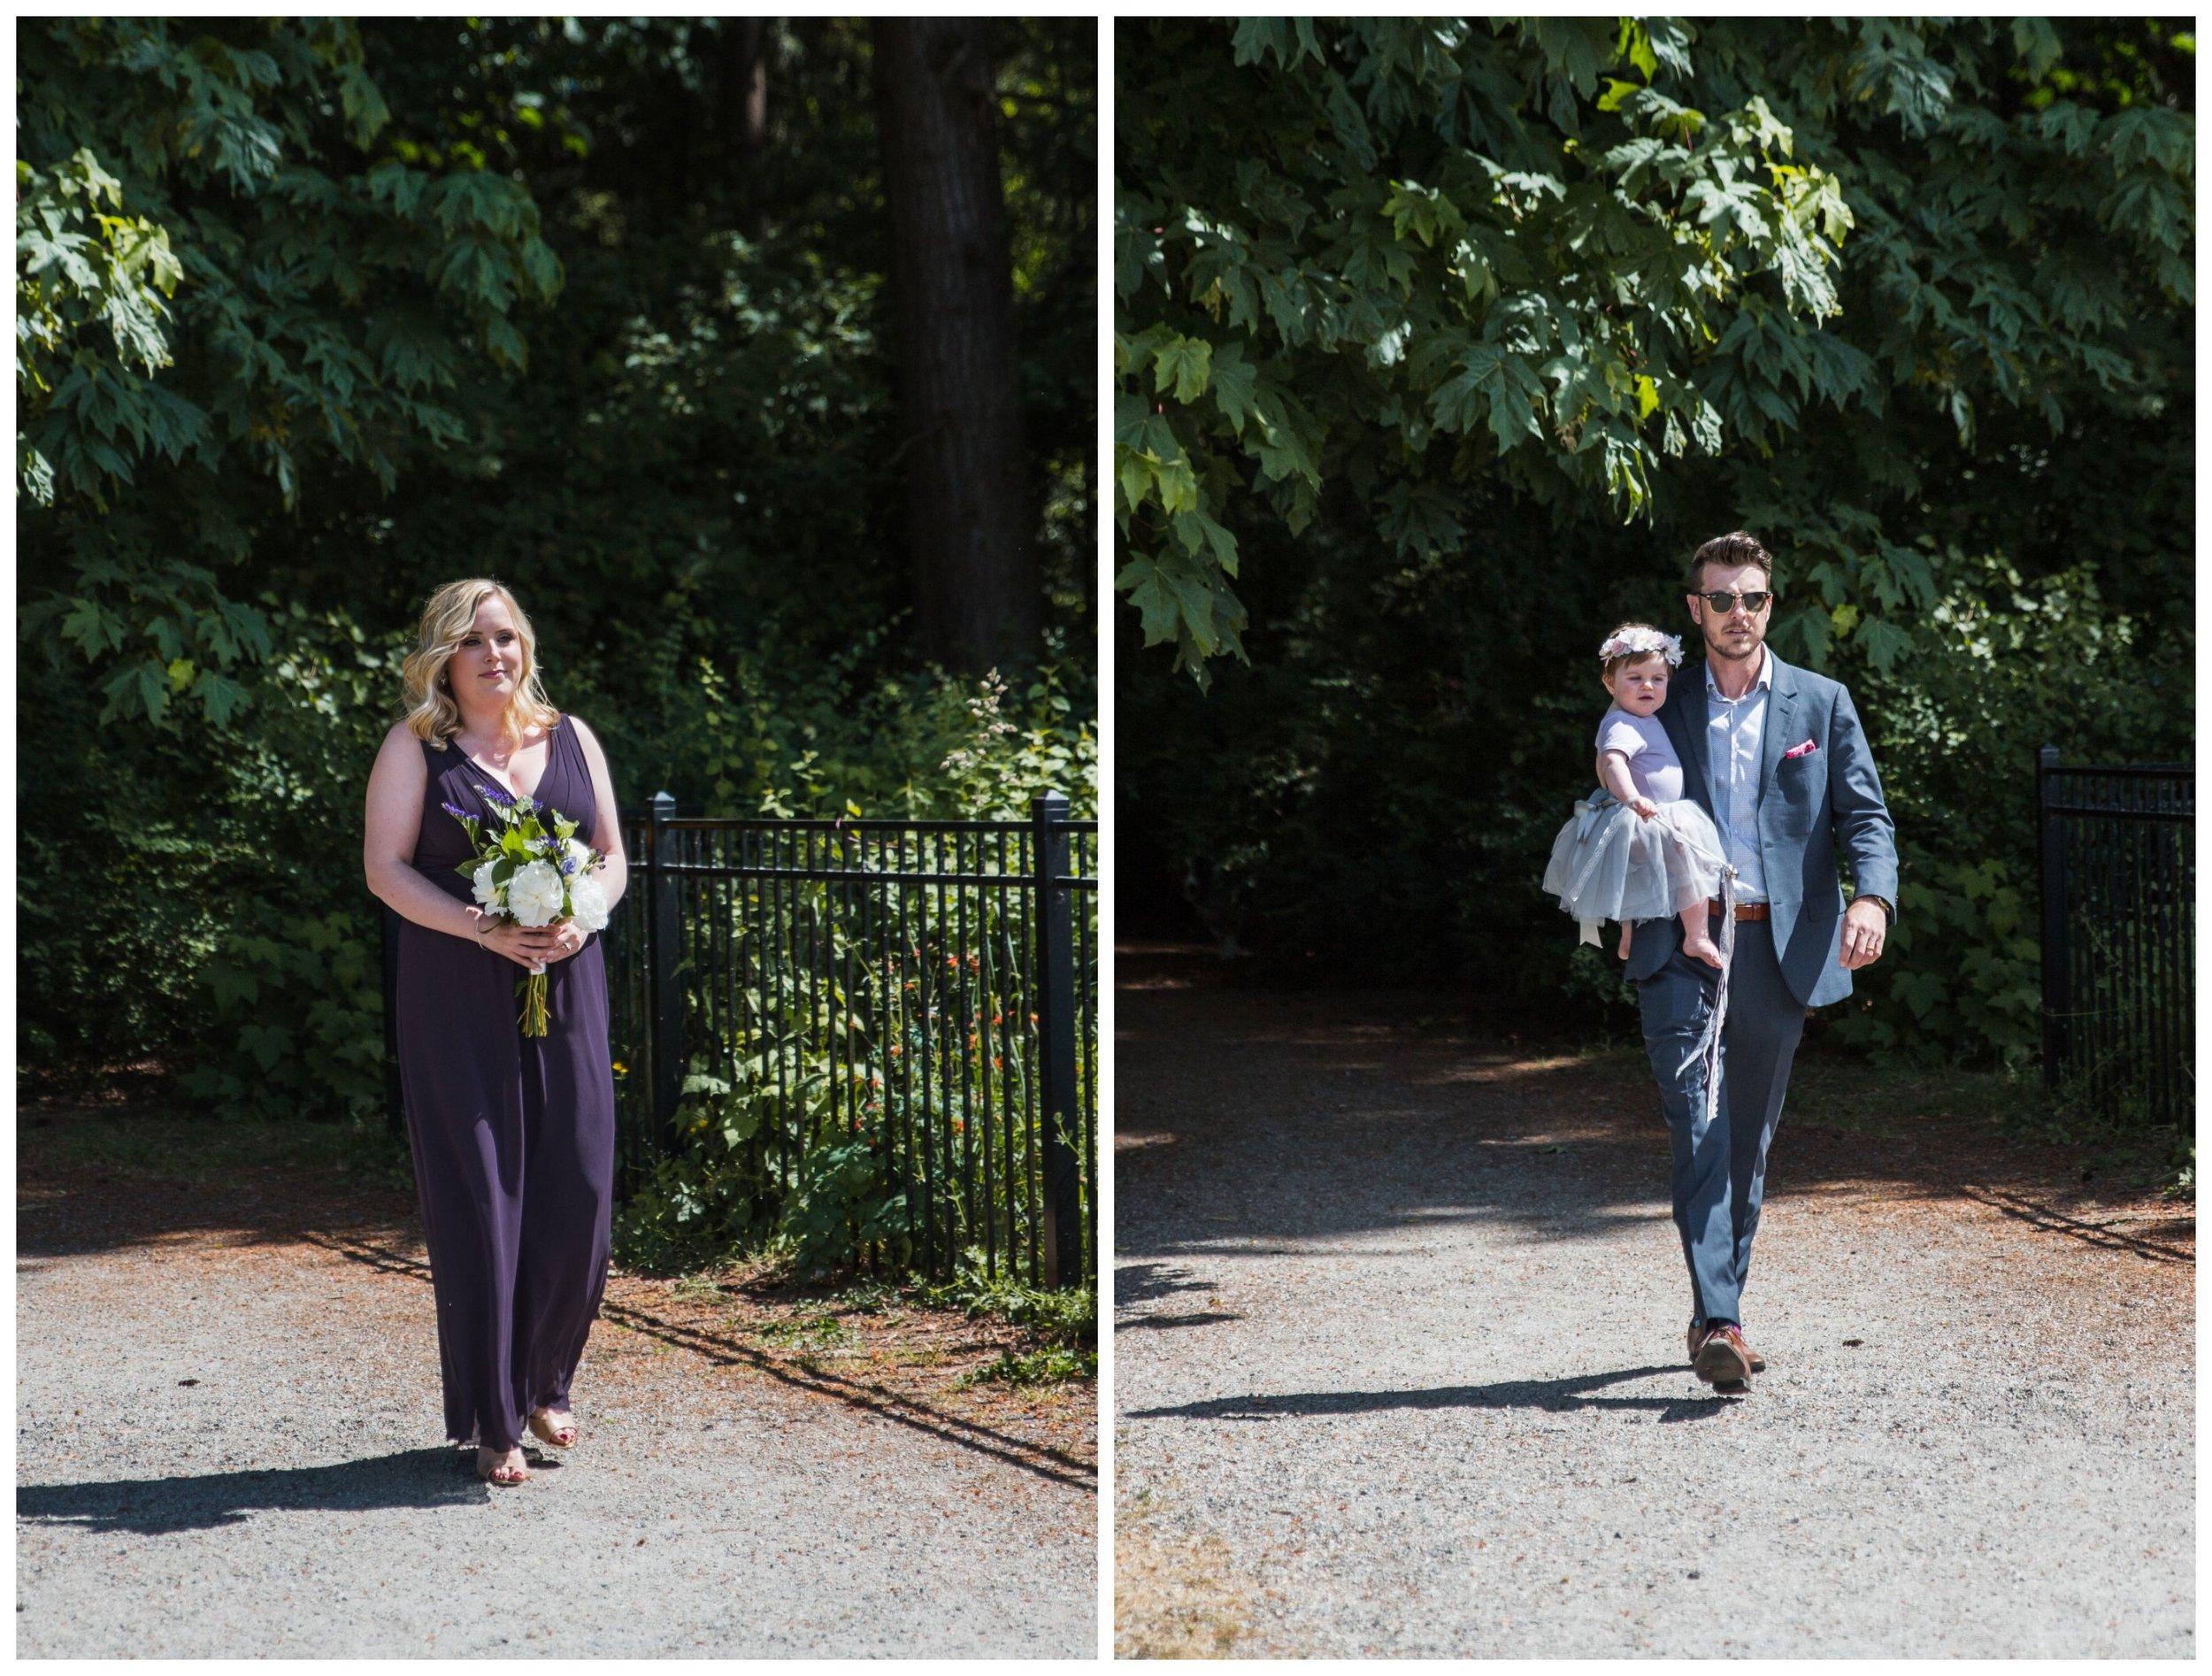 kwomais point park wedding ceremony2.jpg